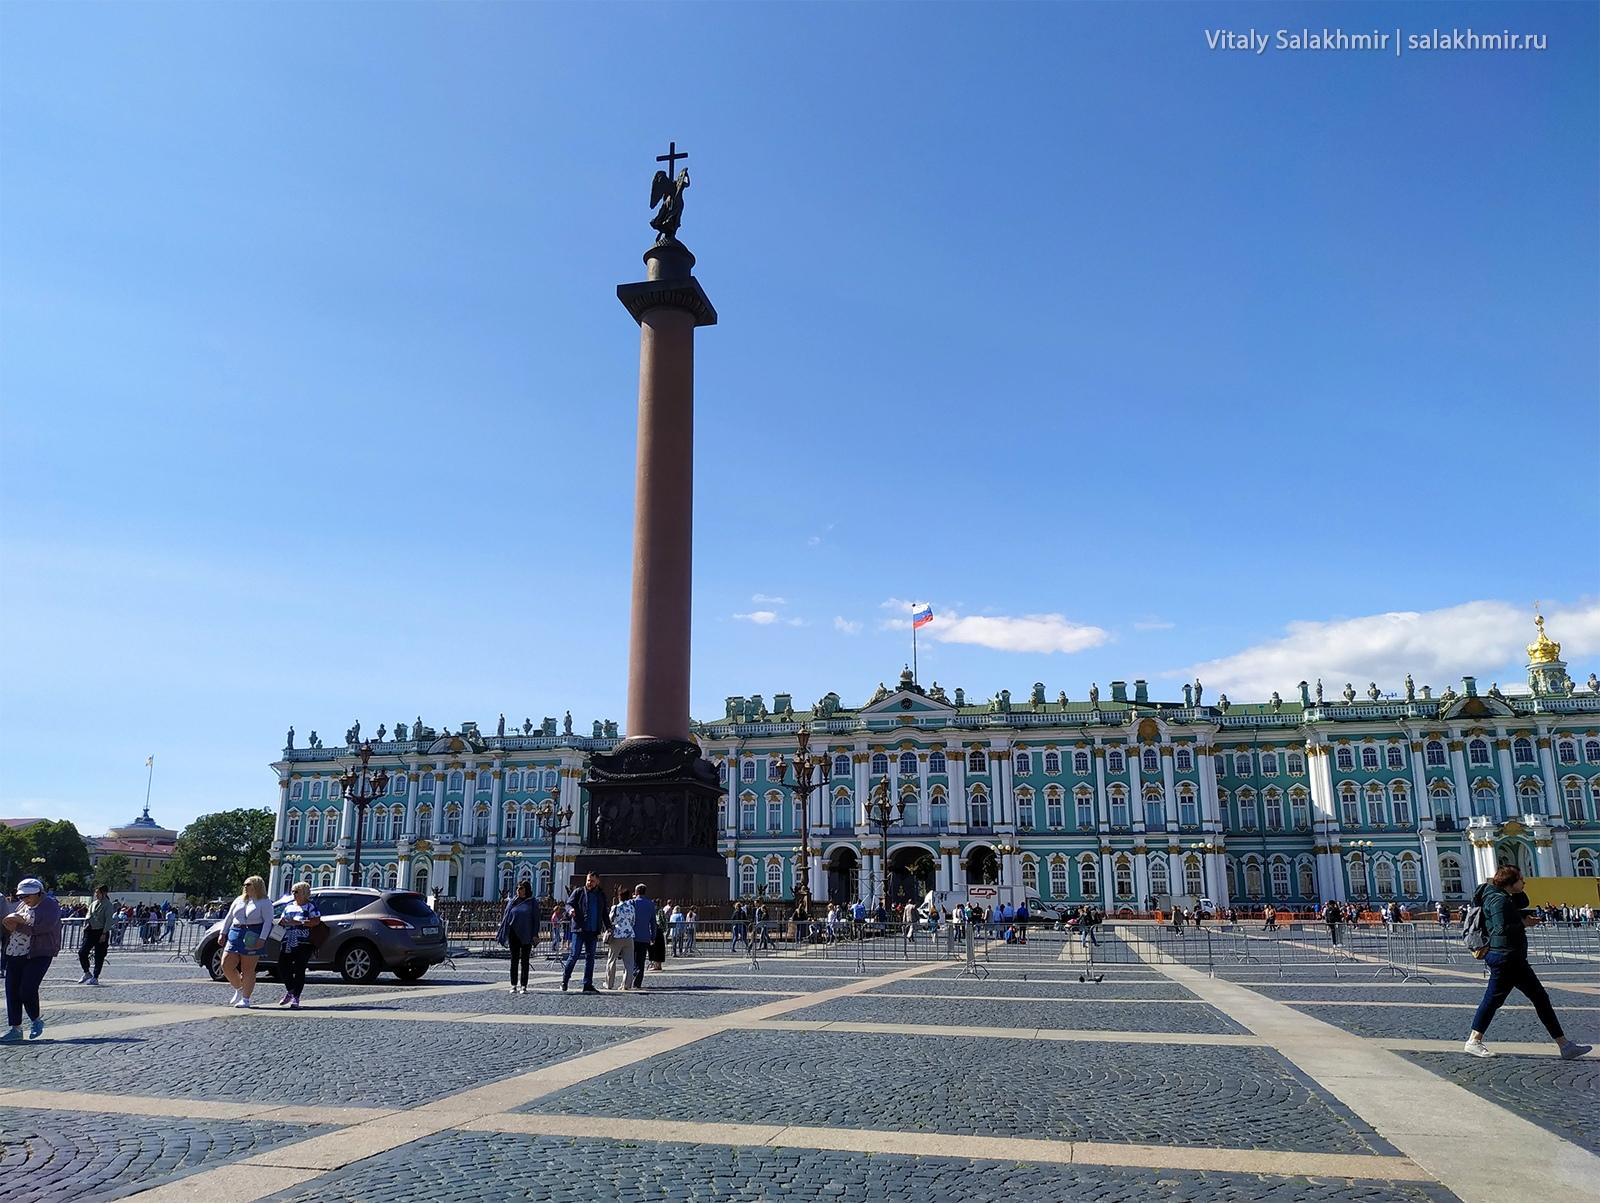 Дворцовая площадь, Санкт-Петербург 2019